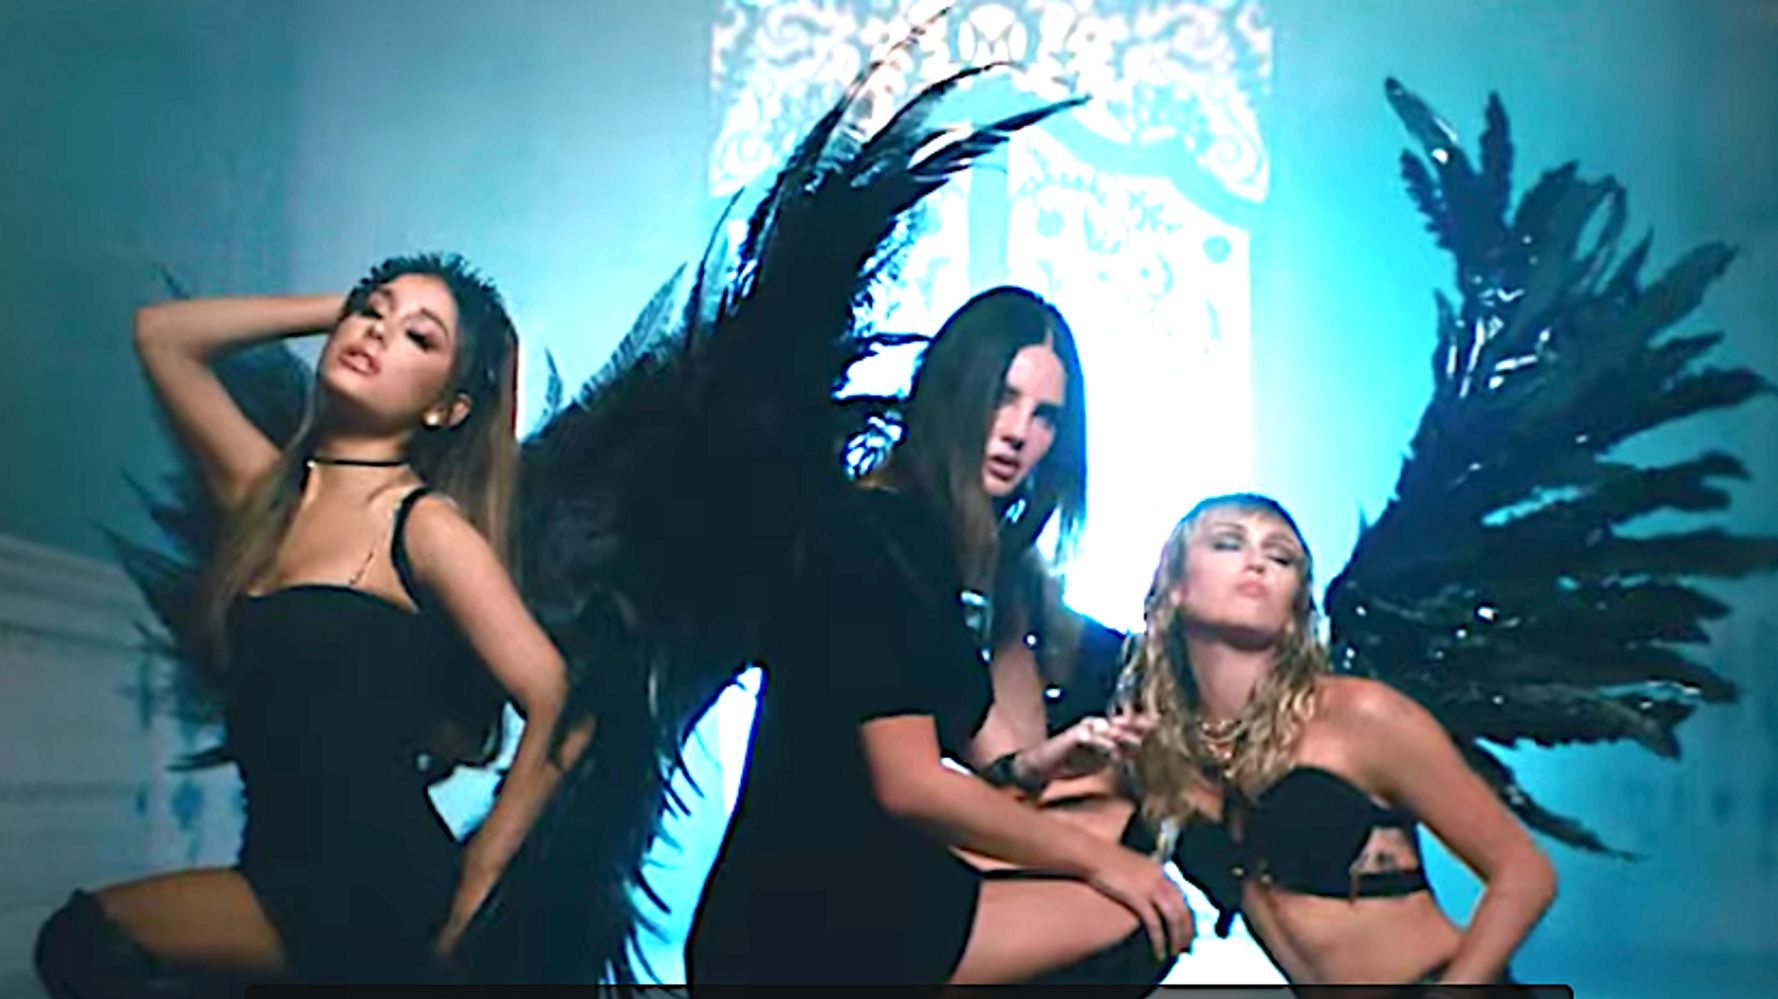 Westlake Legal Group 5d7b6188230000580552a4e9 Miley Cyrus, Ariana Grande, Lana Del Rey Soar In 'Don't Call Me Angel'